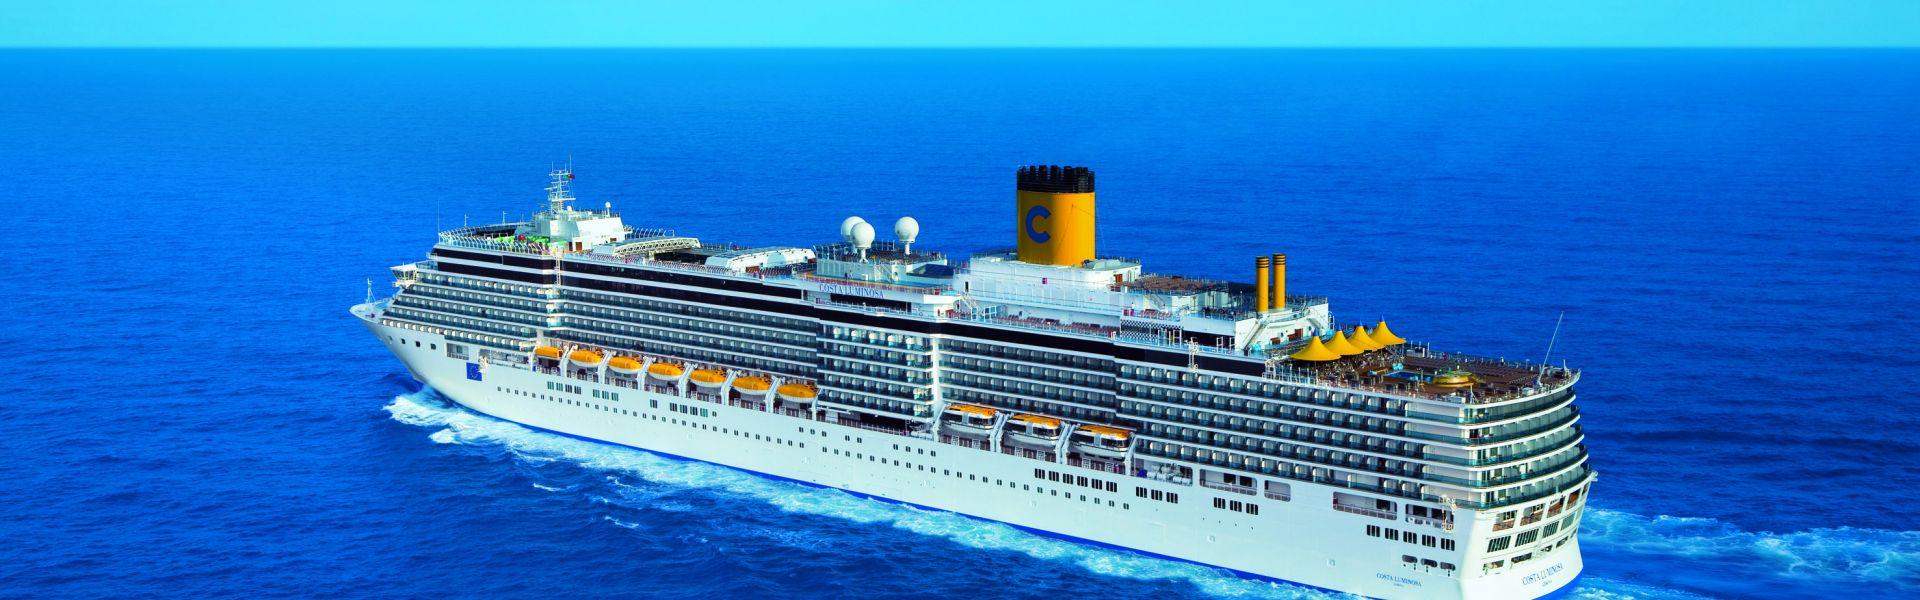 Croaziera 2017 - Mediterana de Est (Venetia) - Costa Cruises - Costa Luminosa - 7 nopti